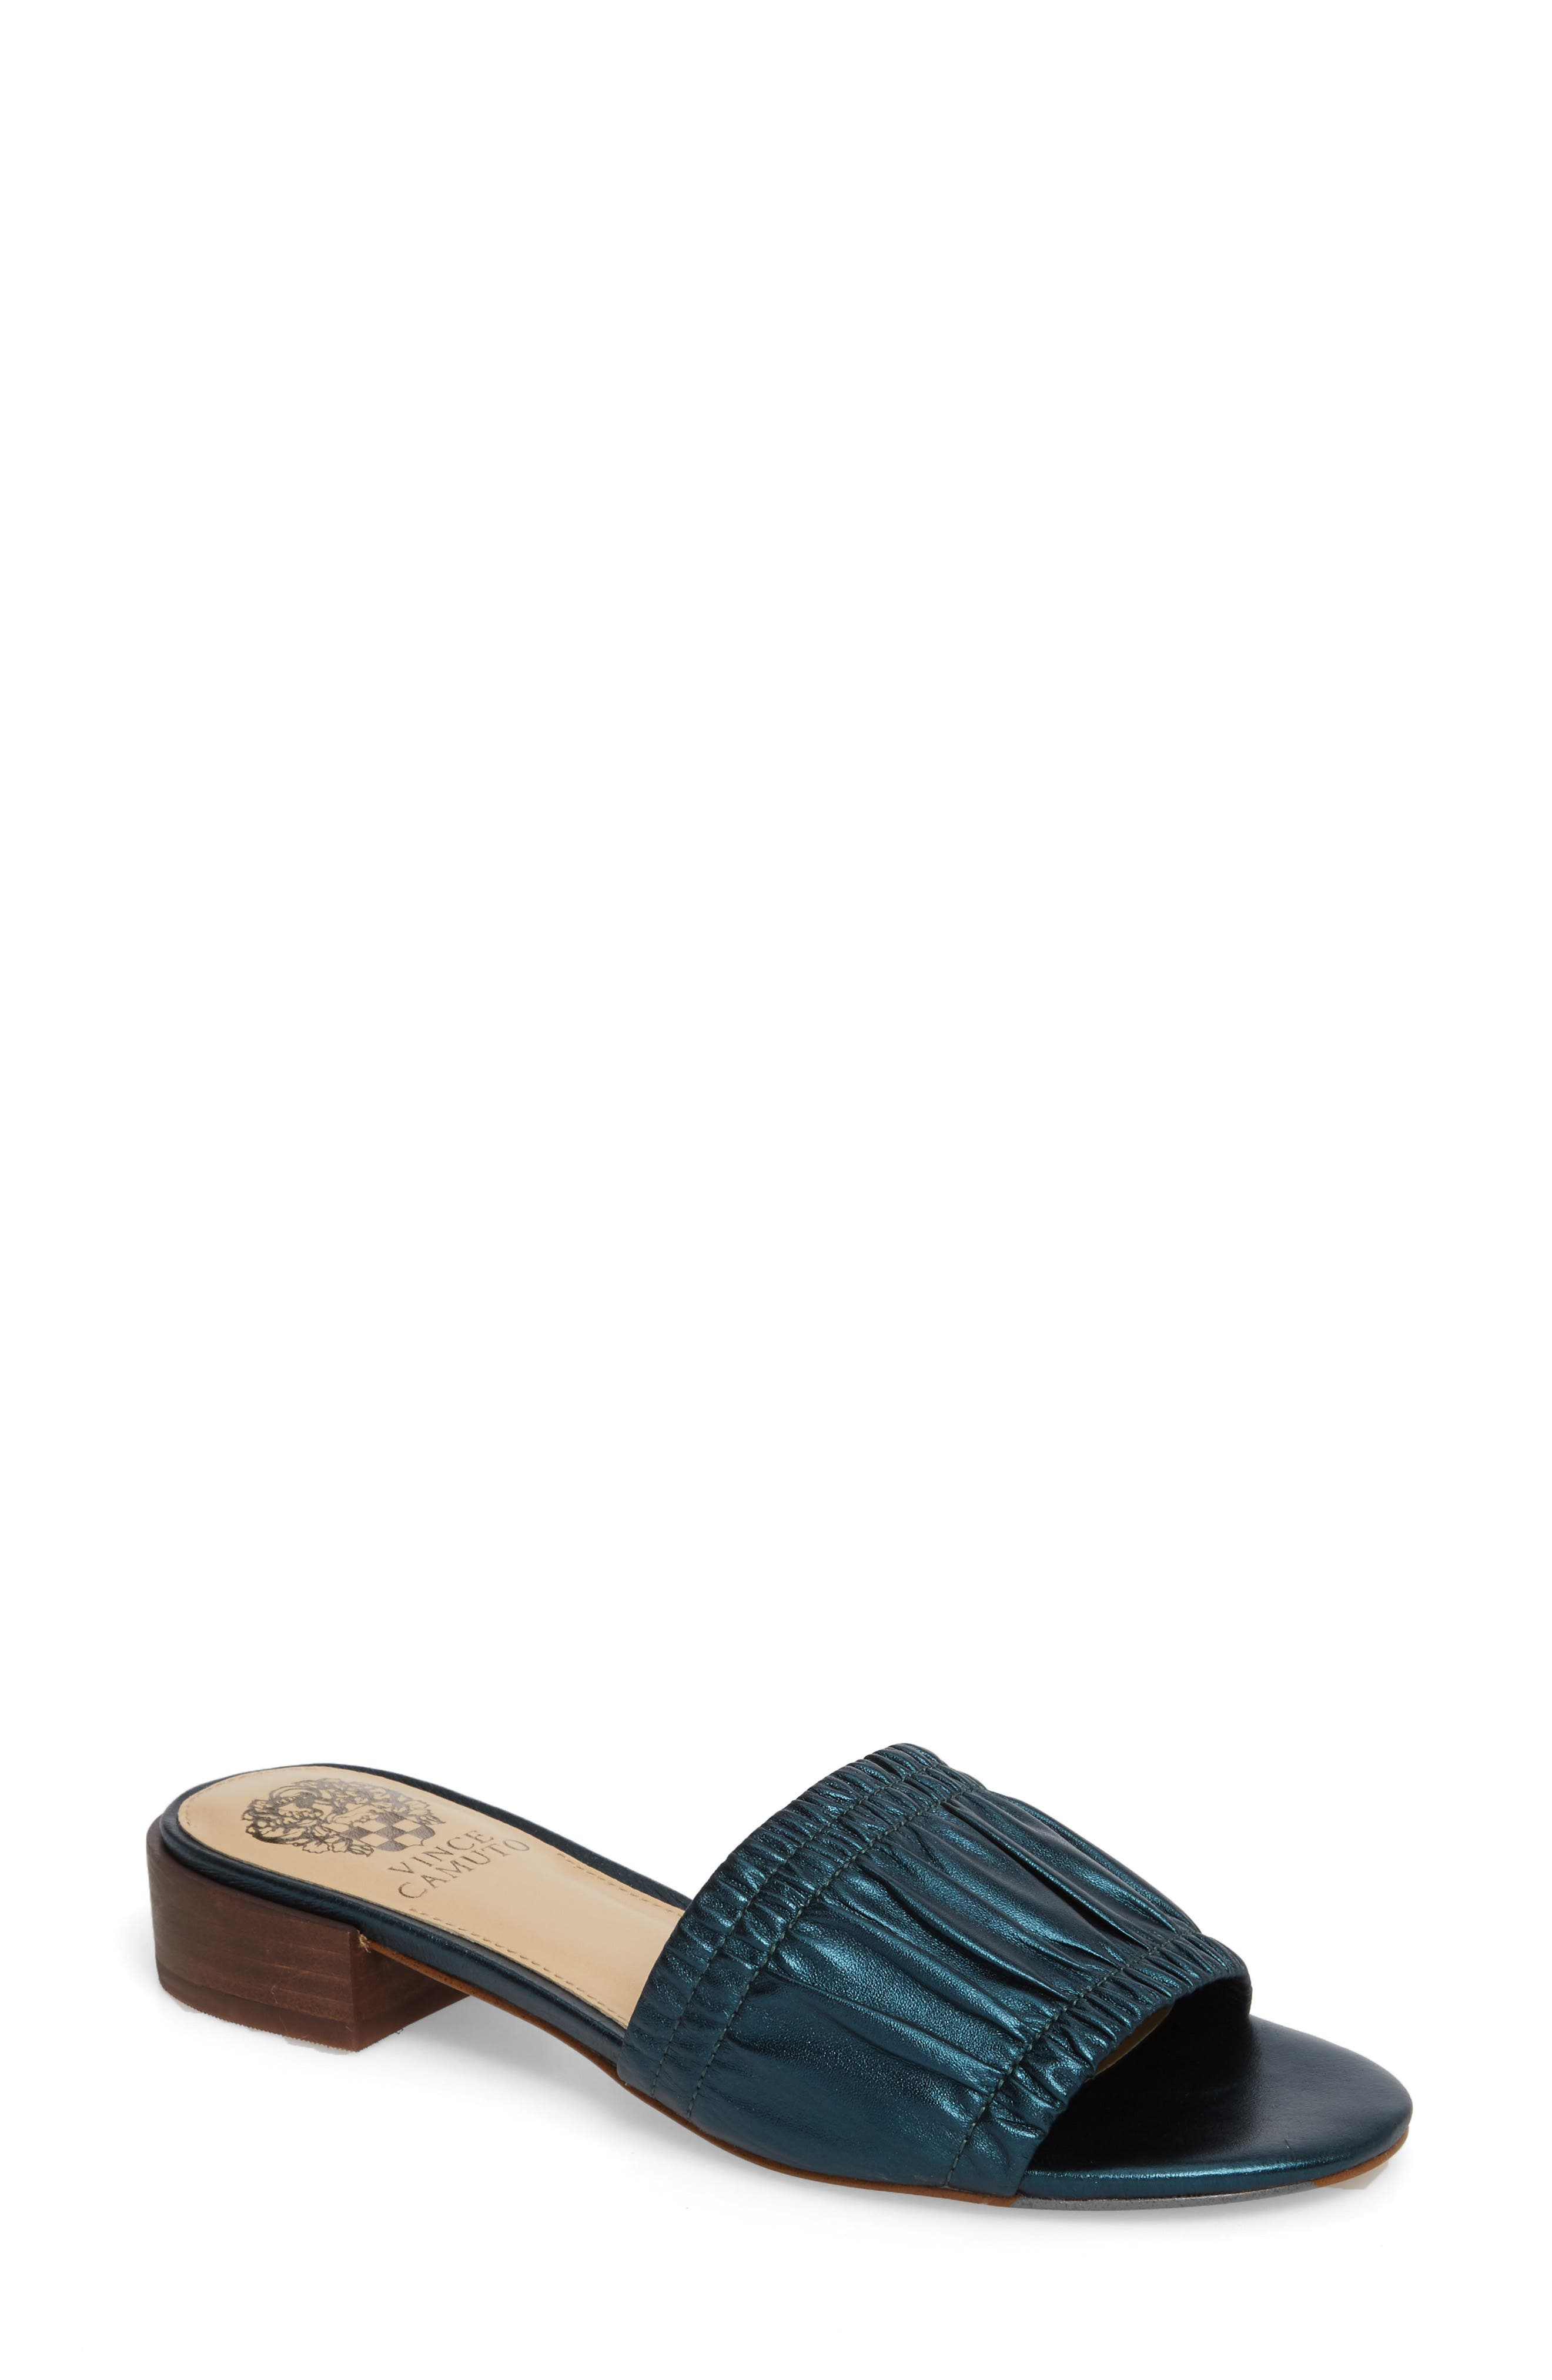 Nanita Pleated Slide Sandal,                             Main thumbnail 1, color,                             Metal Teal Fabric